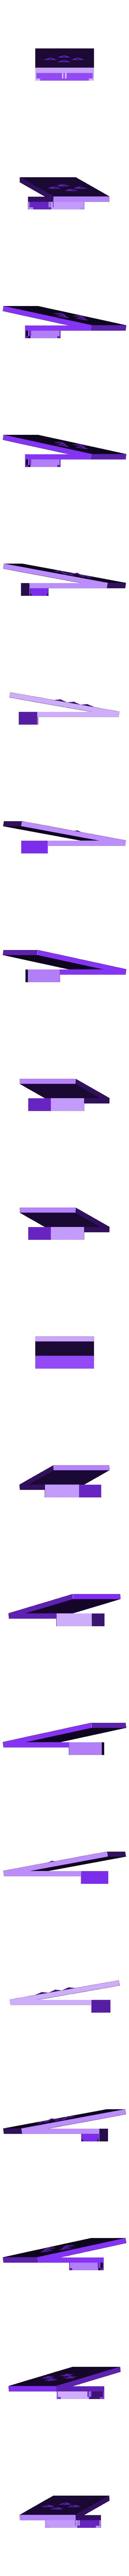 SUPPORT-HAUTV4-OK.stl Télécharger fichier STL Logo italia figc • Objet imprimable en 3D, zimatera